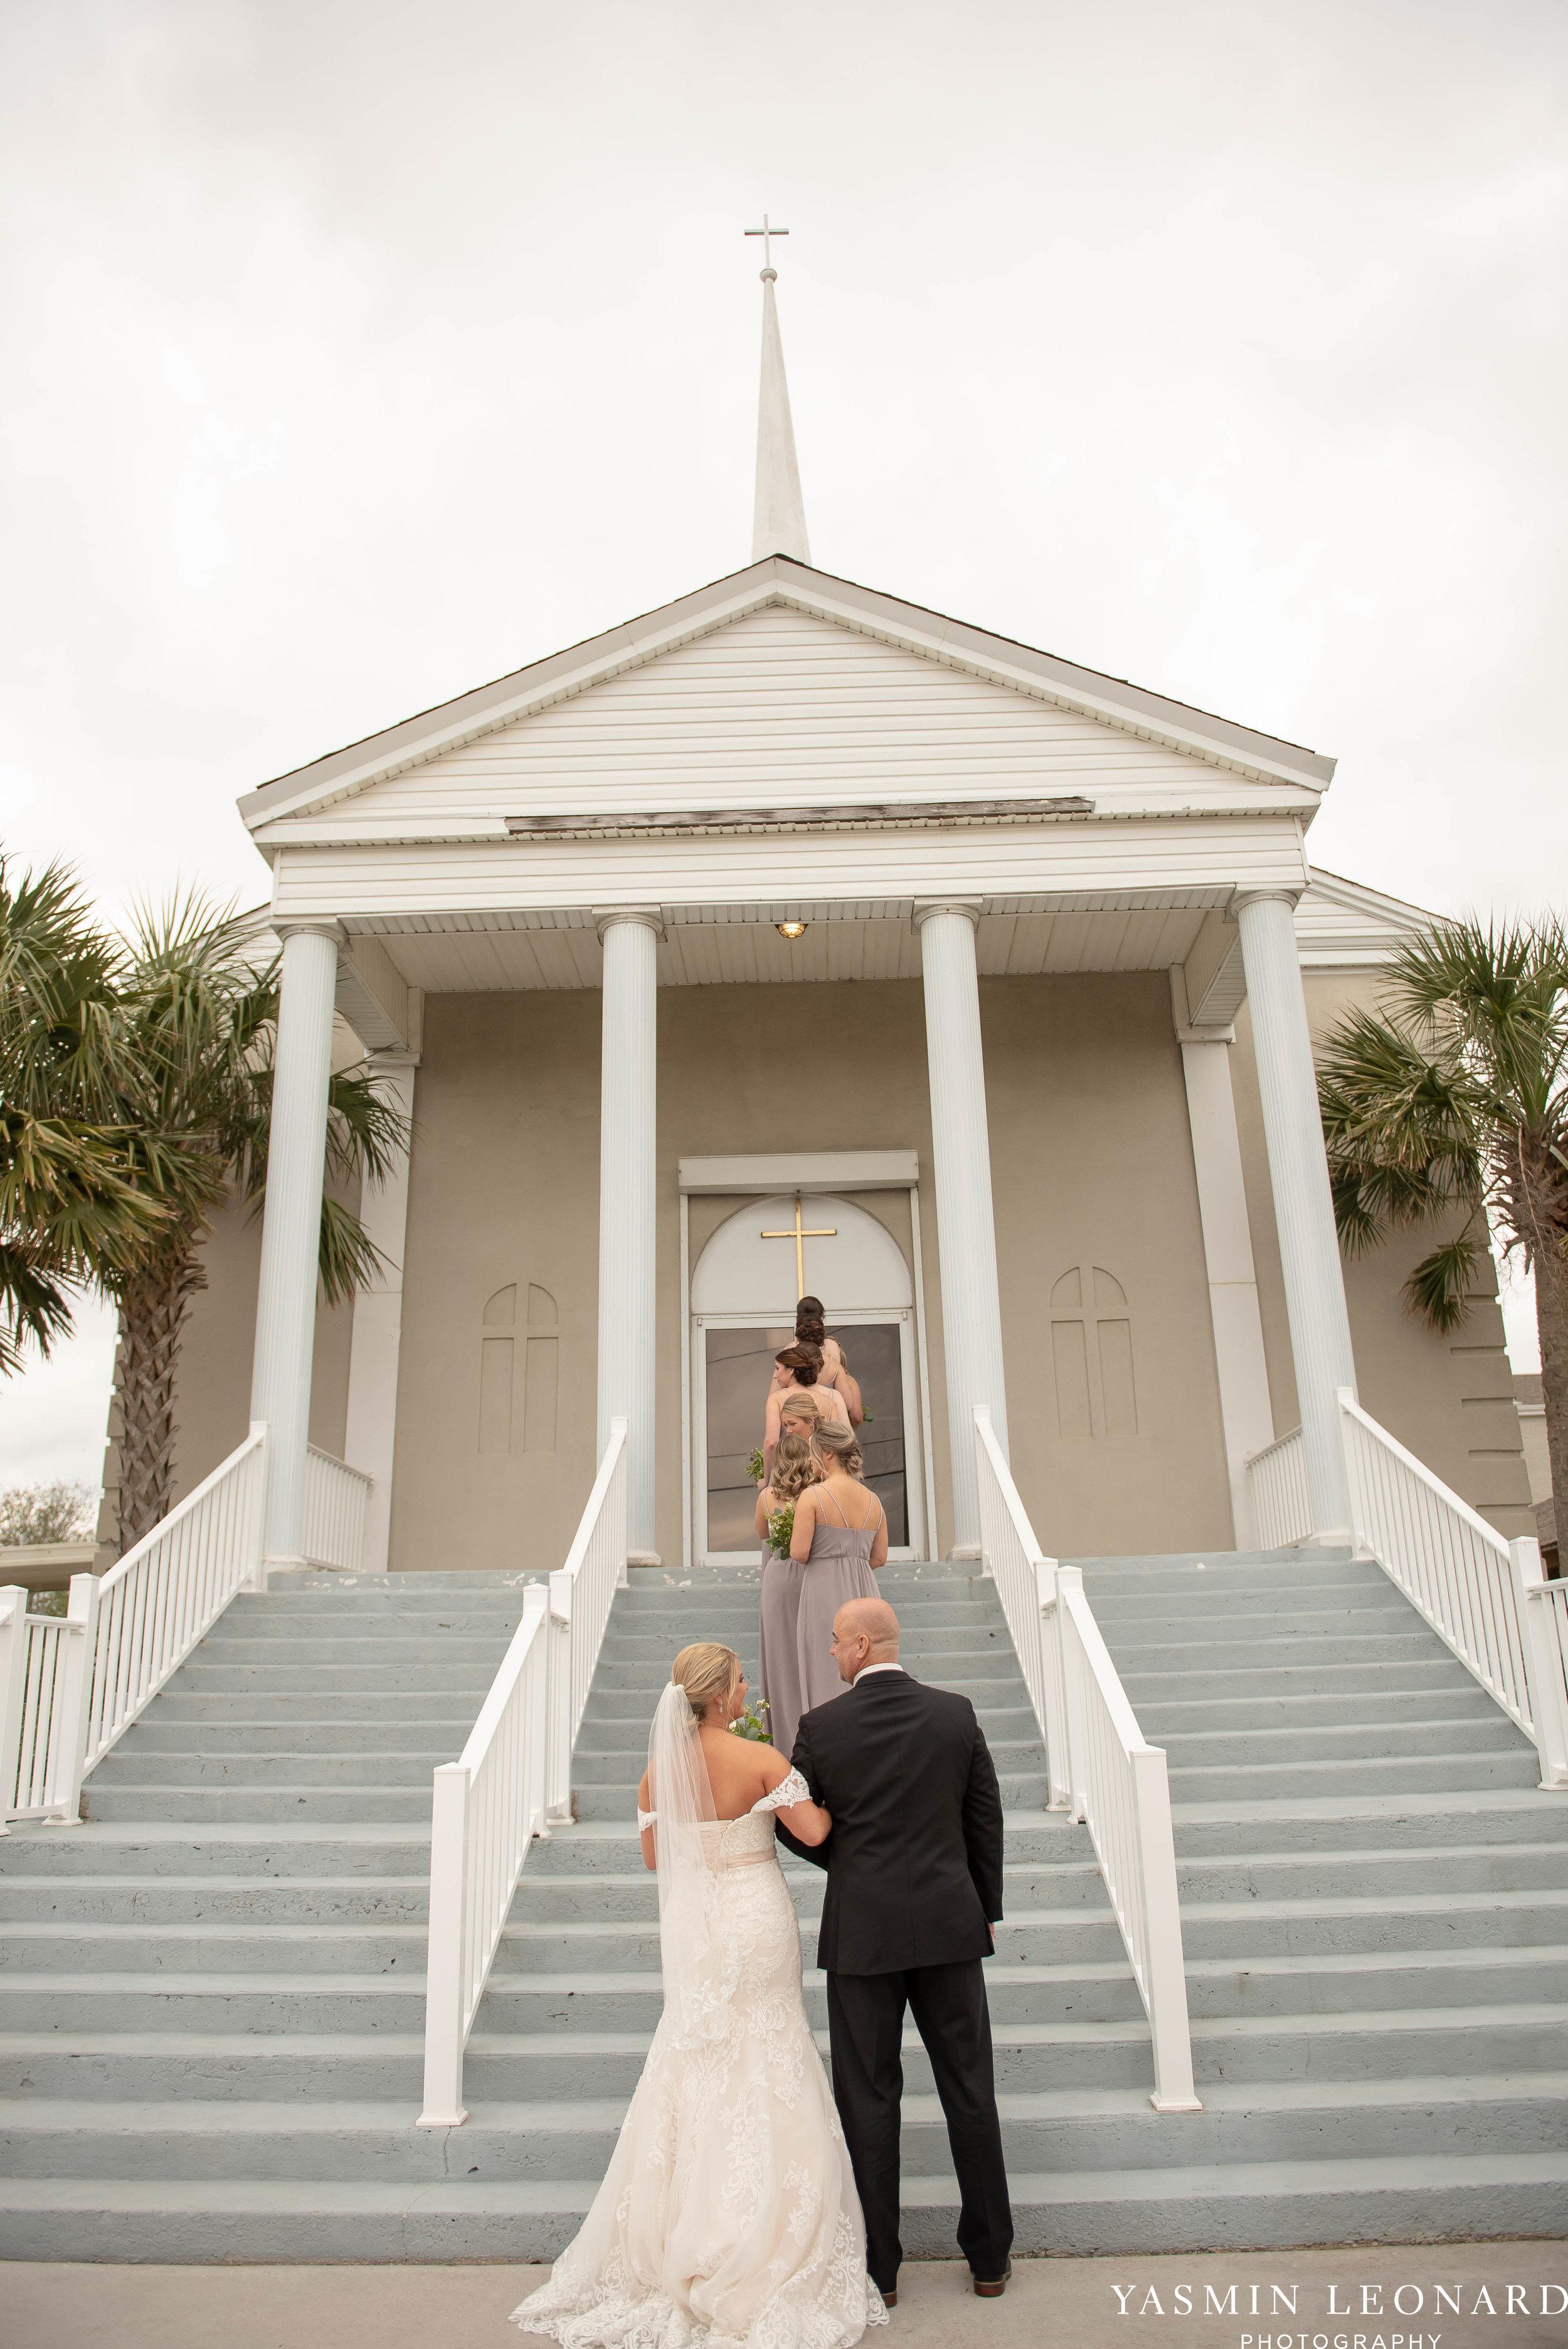 Carolina Beach Wedding - Fort Fisher Wedding - NC Acquarium - Beach Wedding - NC Wedding - Beach Wedding Inspiration - Beach Bride-12.jpg